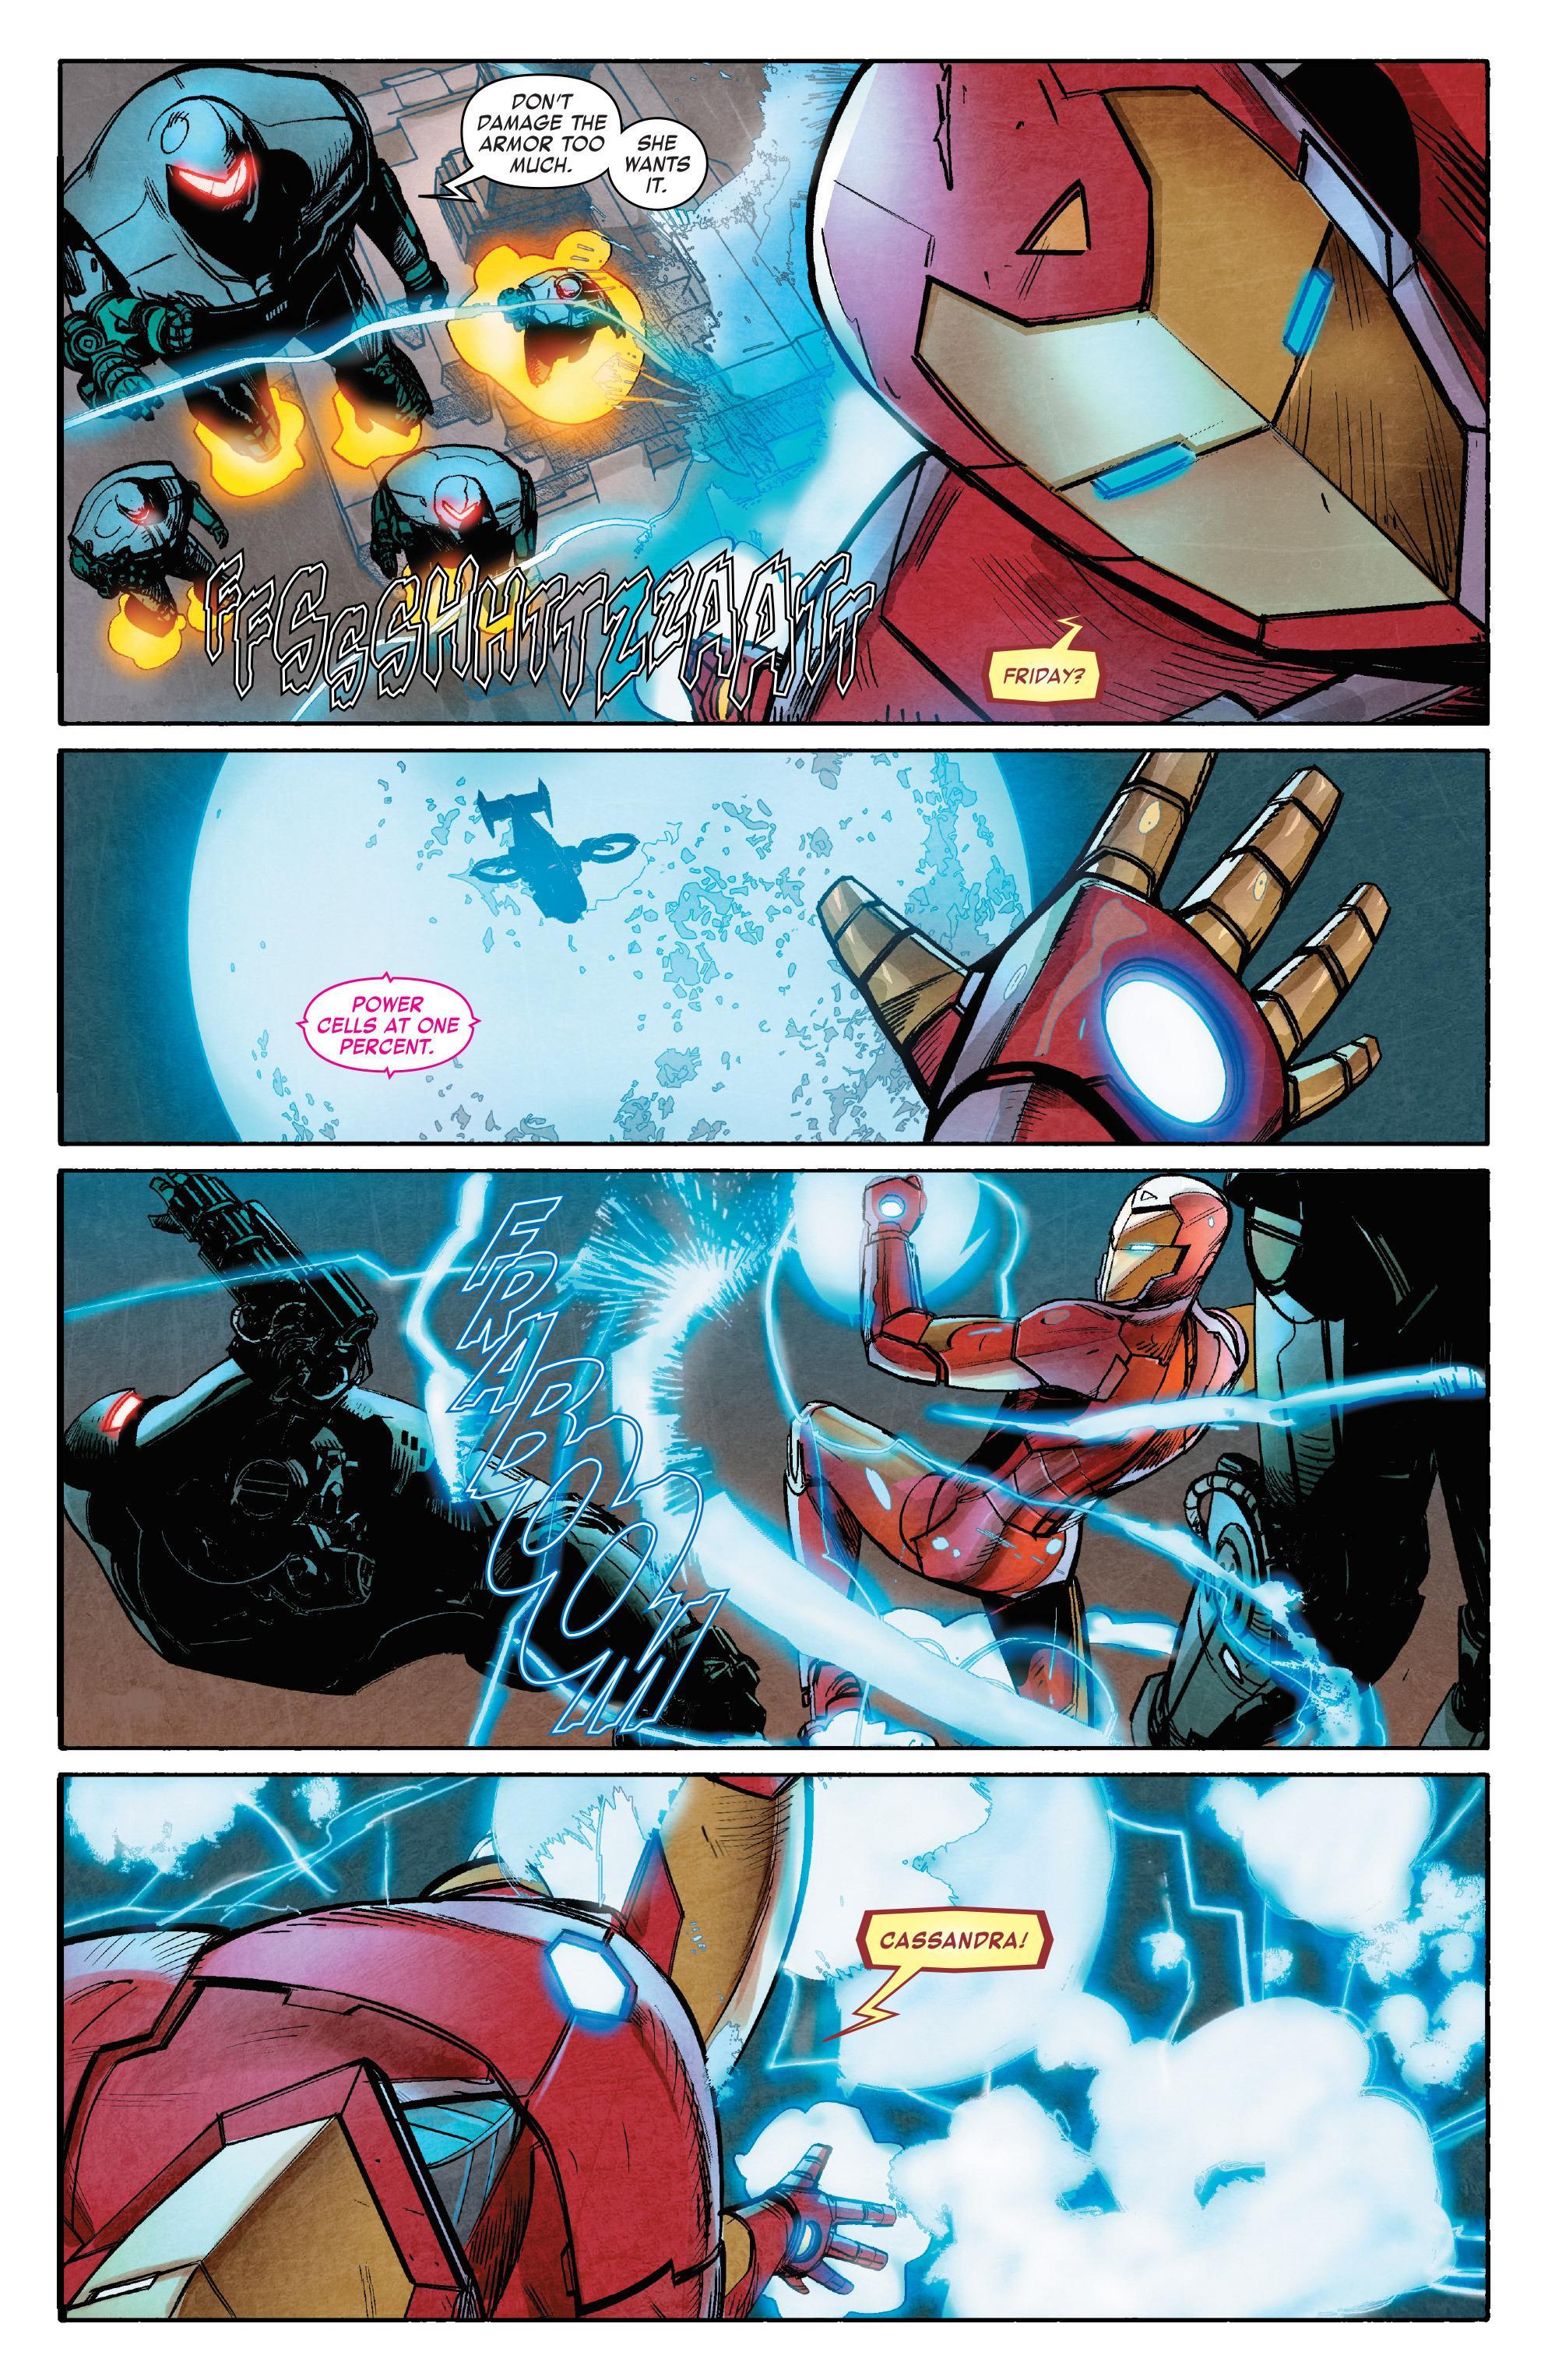 International Iron Man review